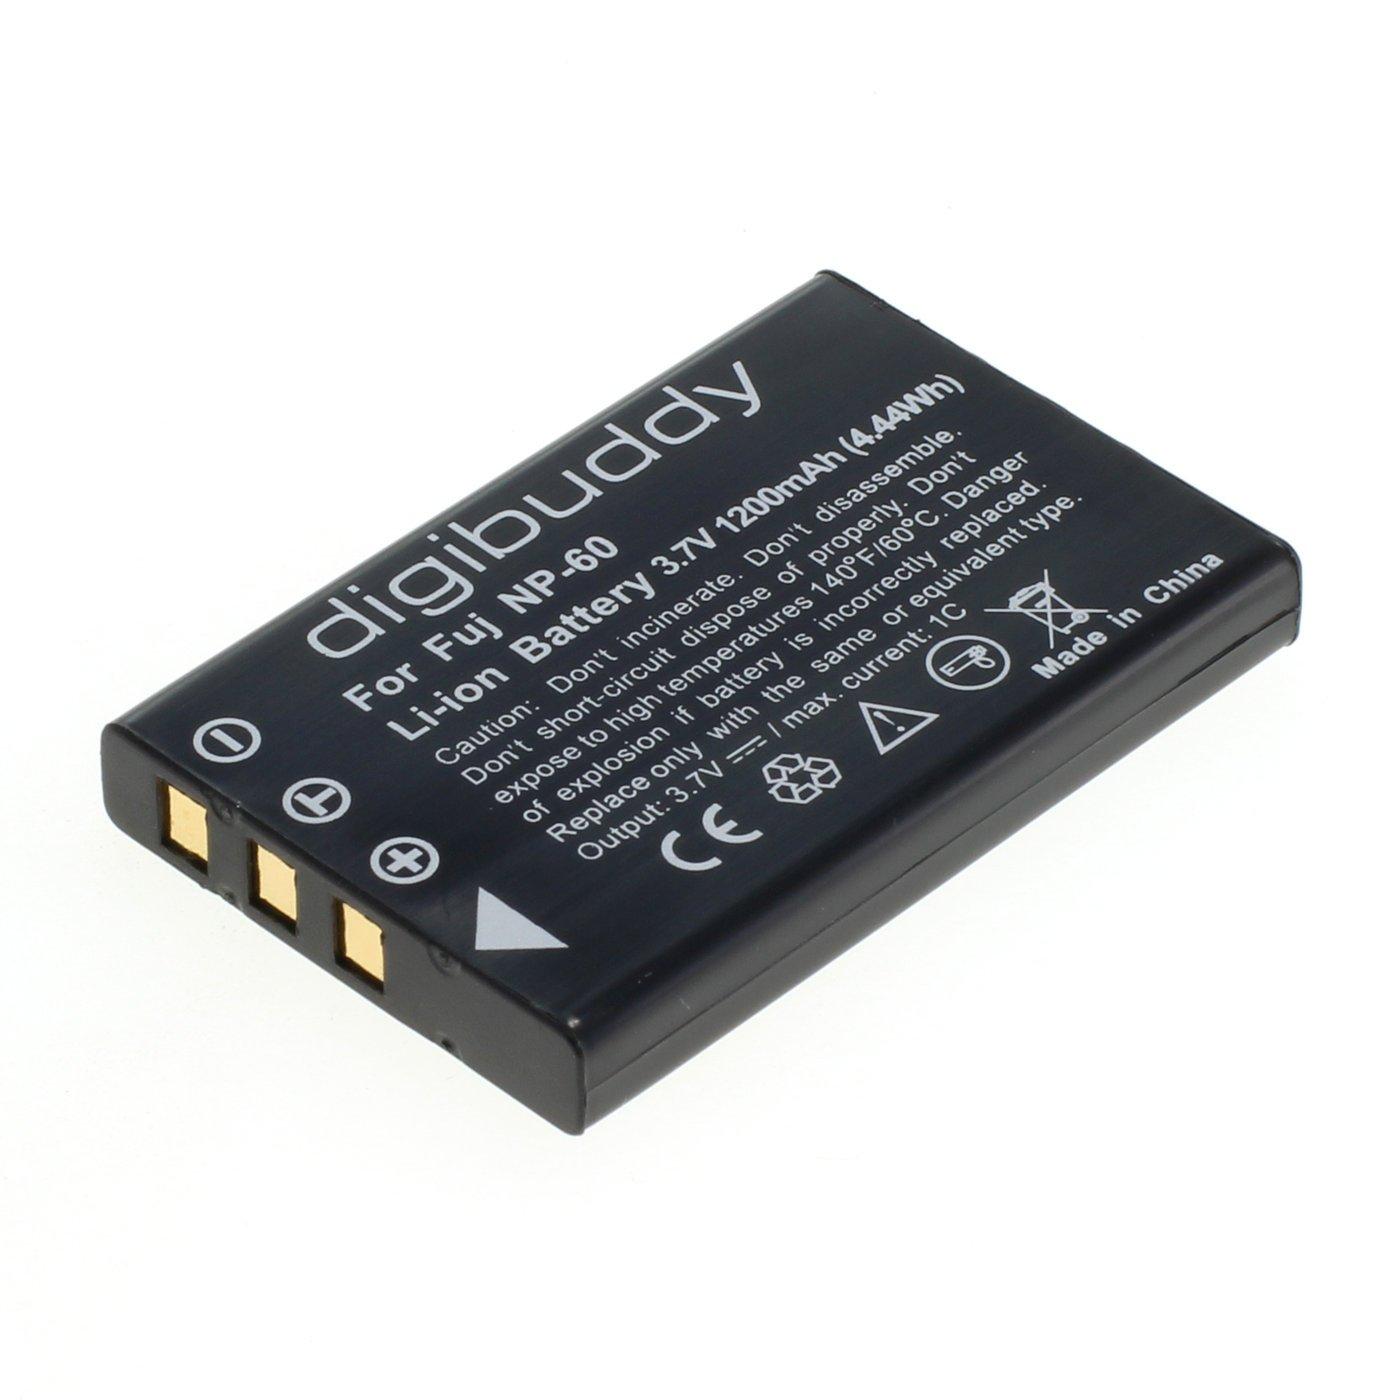 NP-60 - Batería de Ion de Litio para Fuji (1200 mAh, 3,7 V)